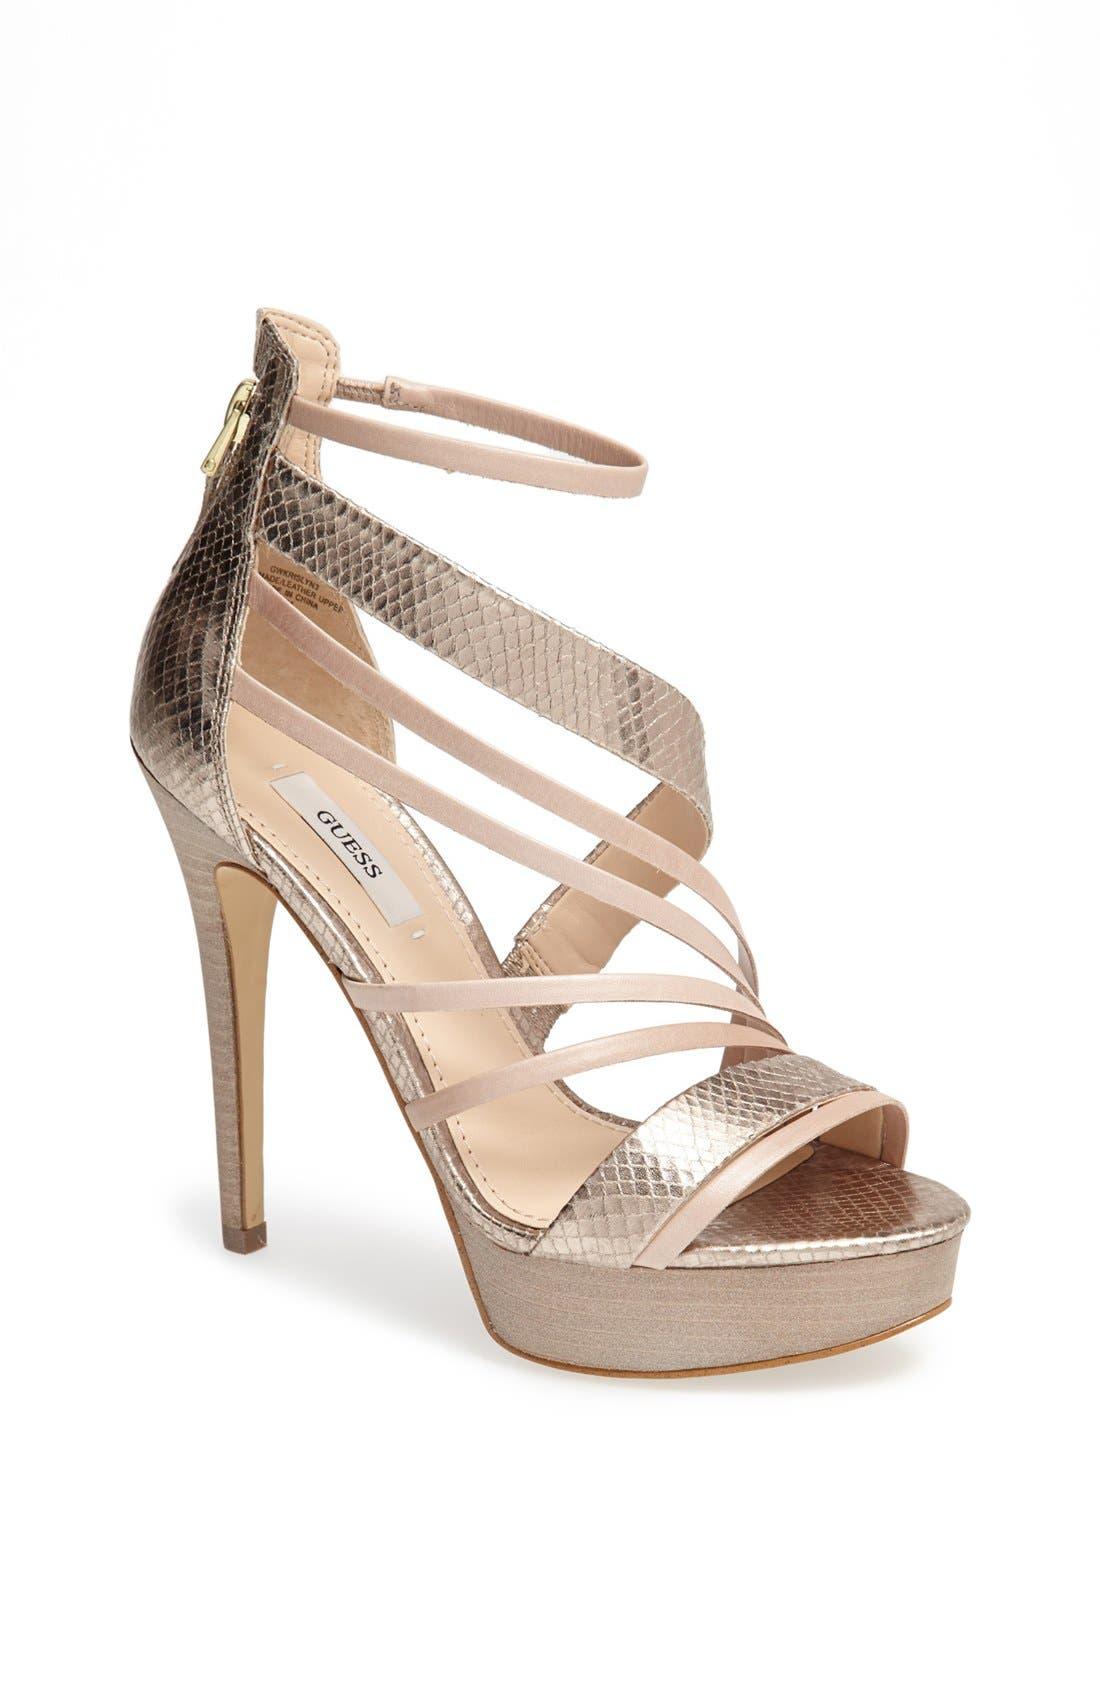 Main Image - GUESS 'Krislyn3' Sandal